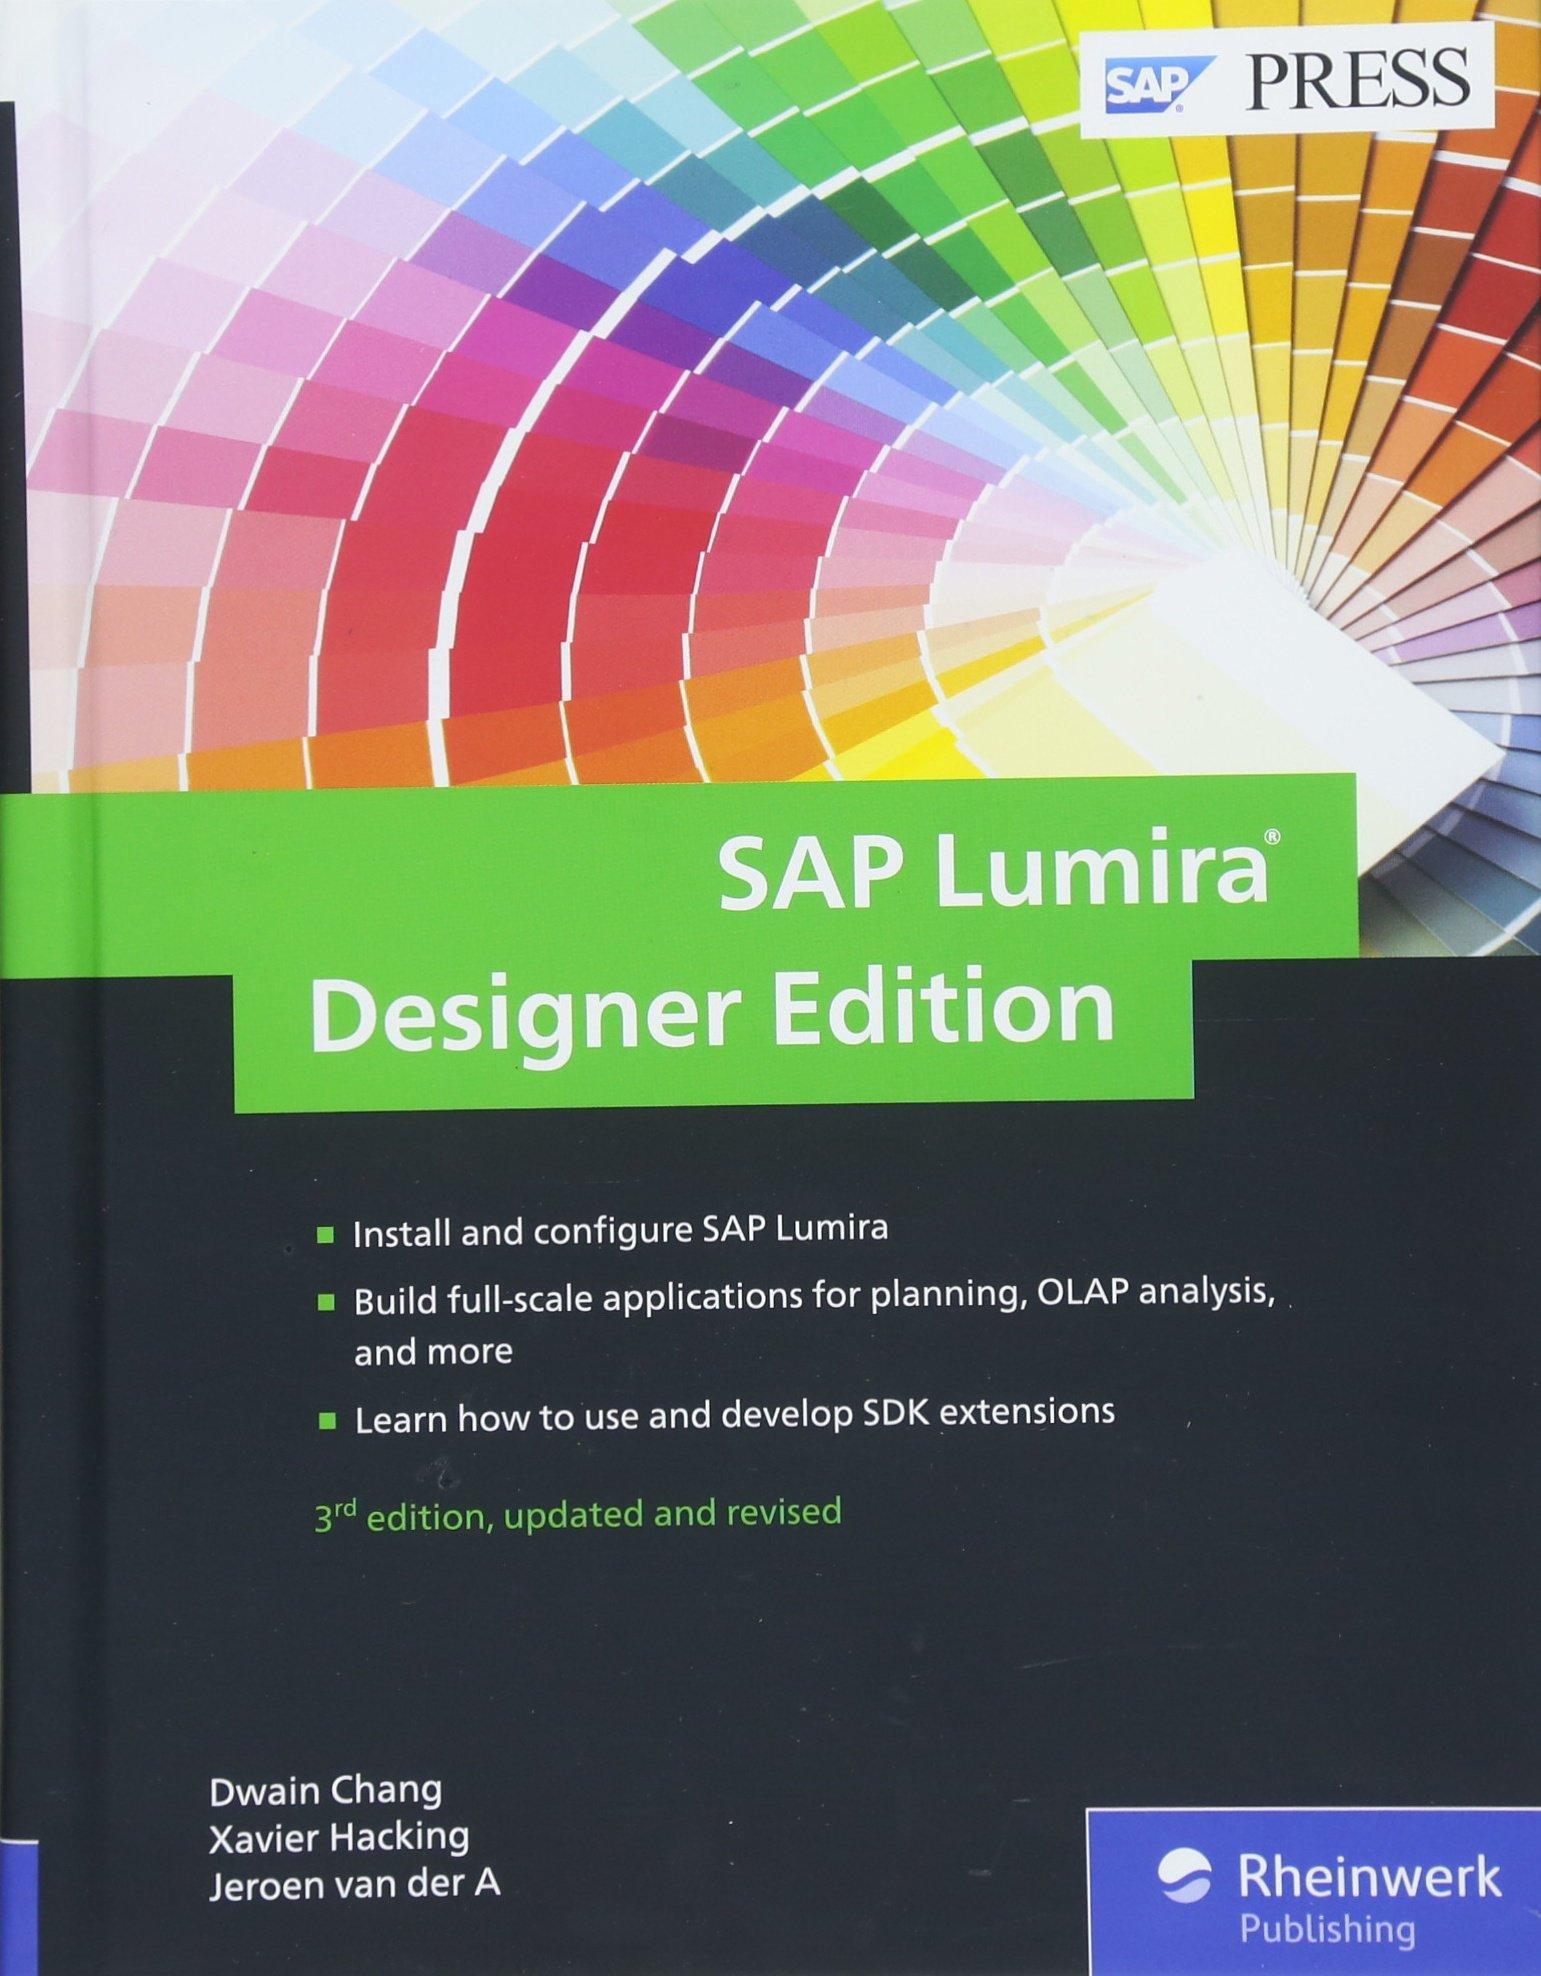 Download SAP Lumira, Designer Edition: The Comprehensive Guide (3rd Edition) (SAP PRESS) PDF